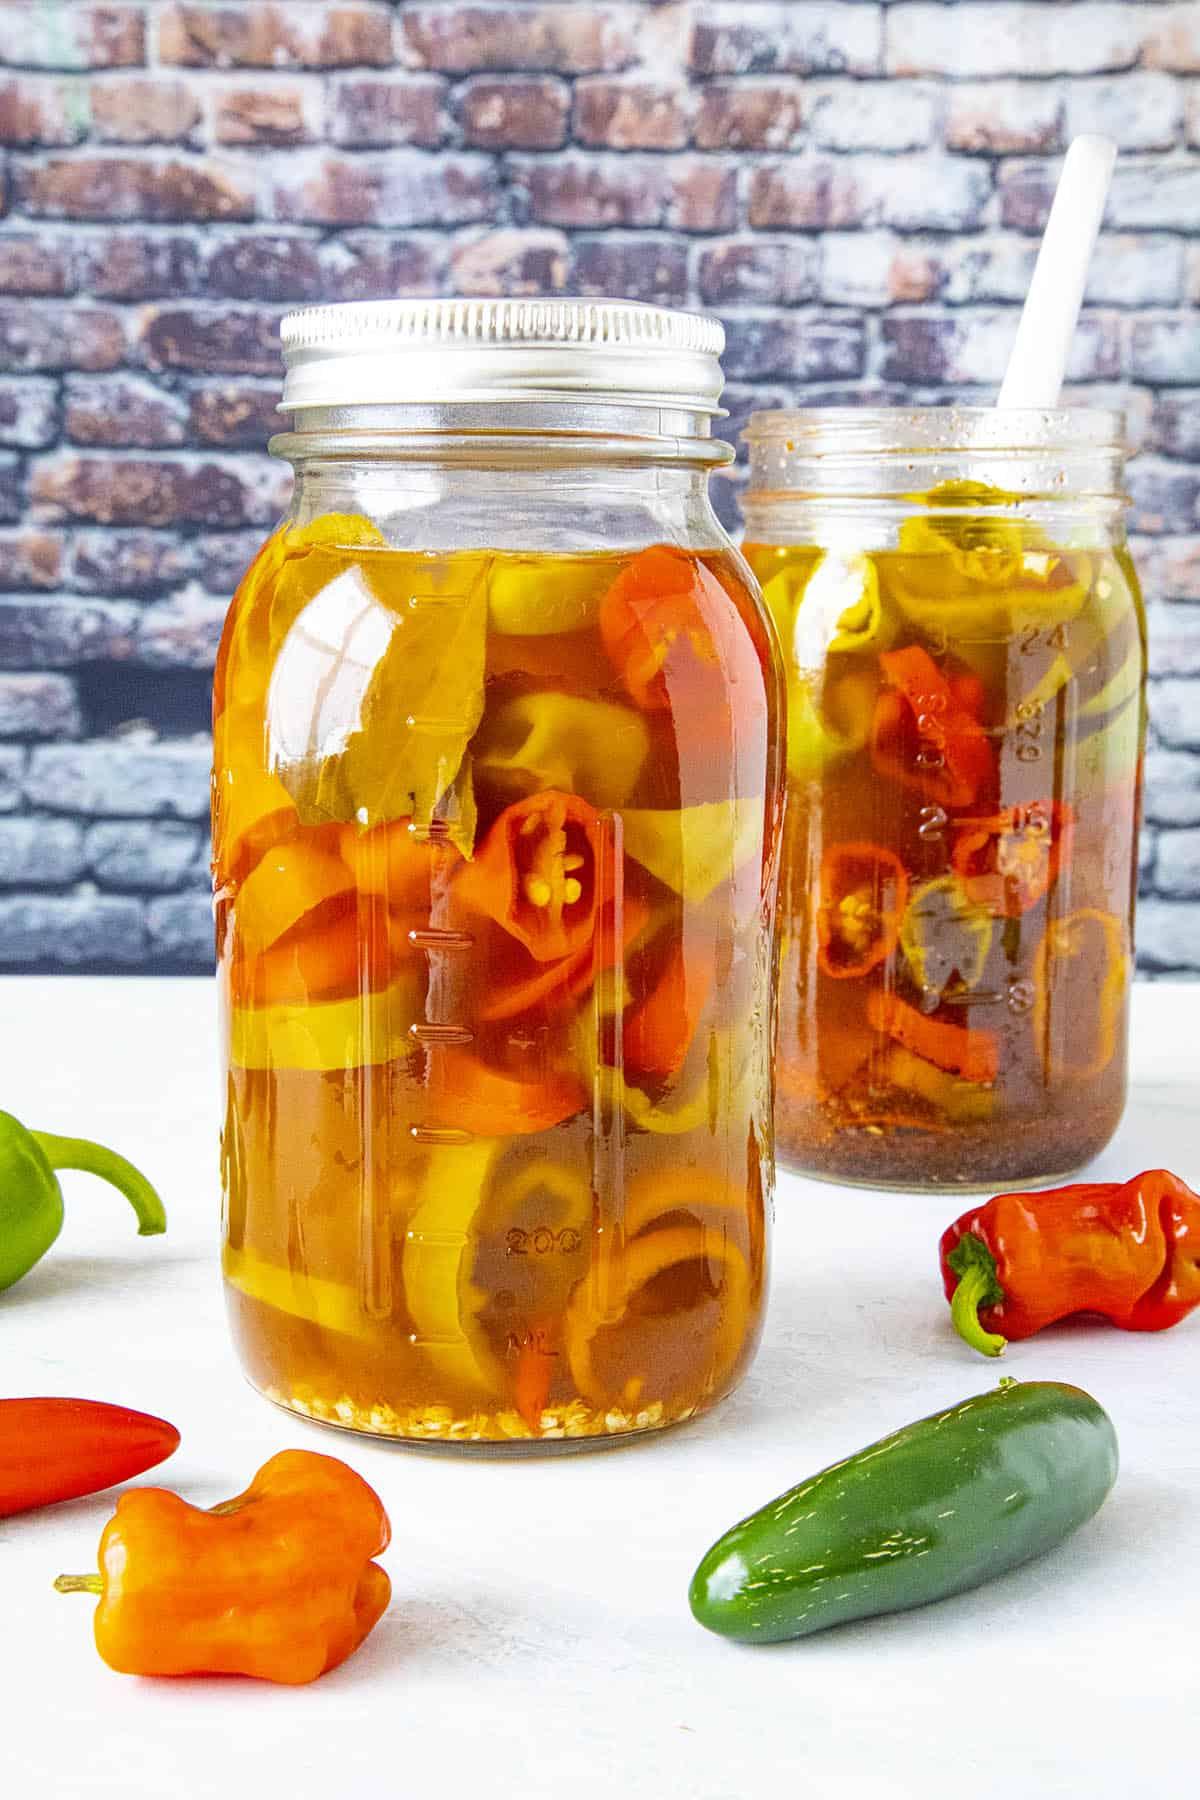 Spicy pickled peppers with Cajun seasoning in 2 jars